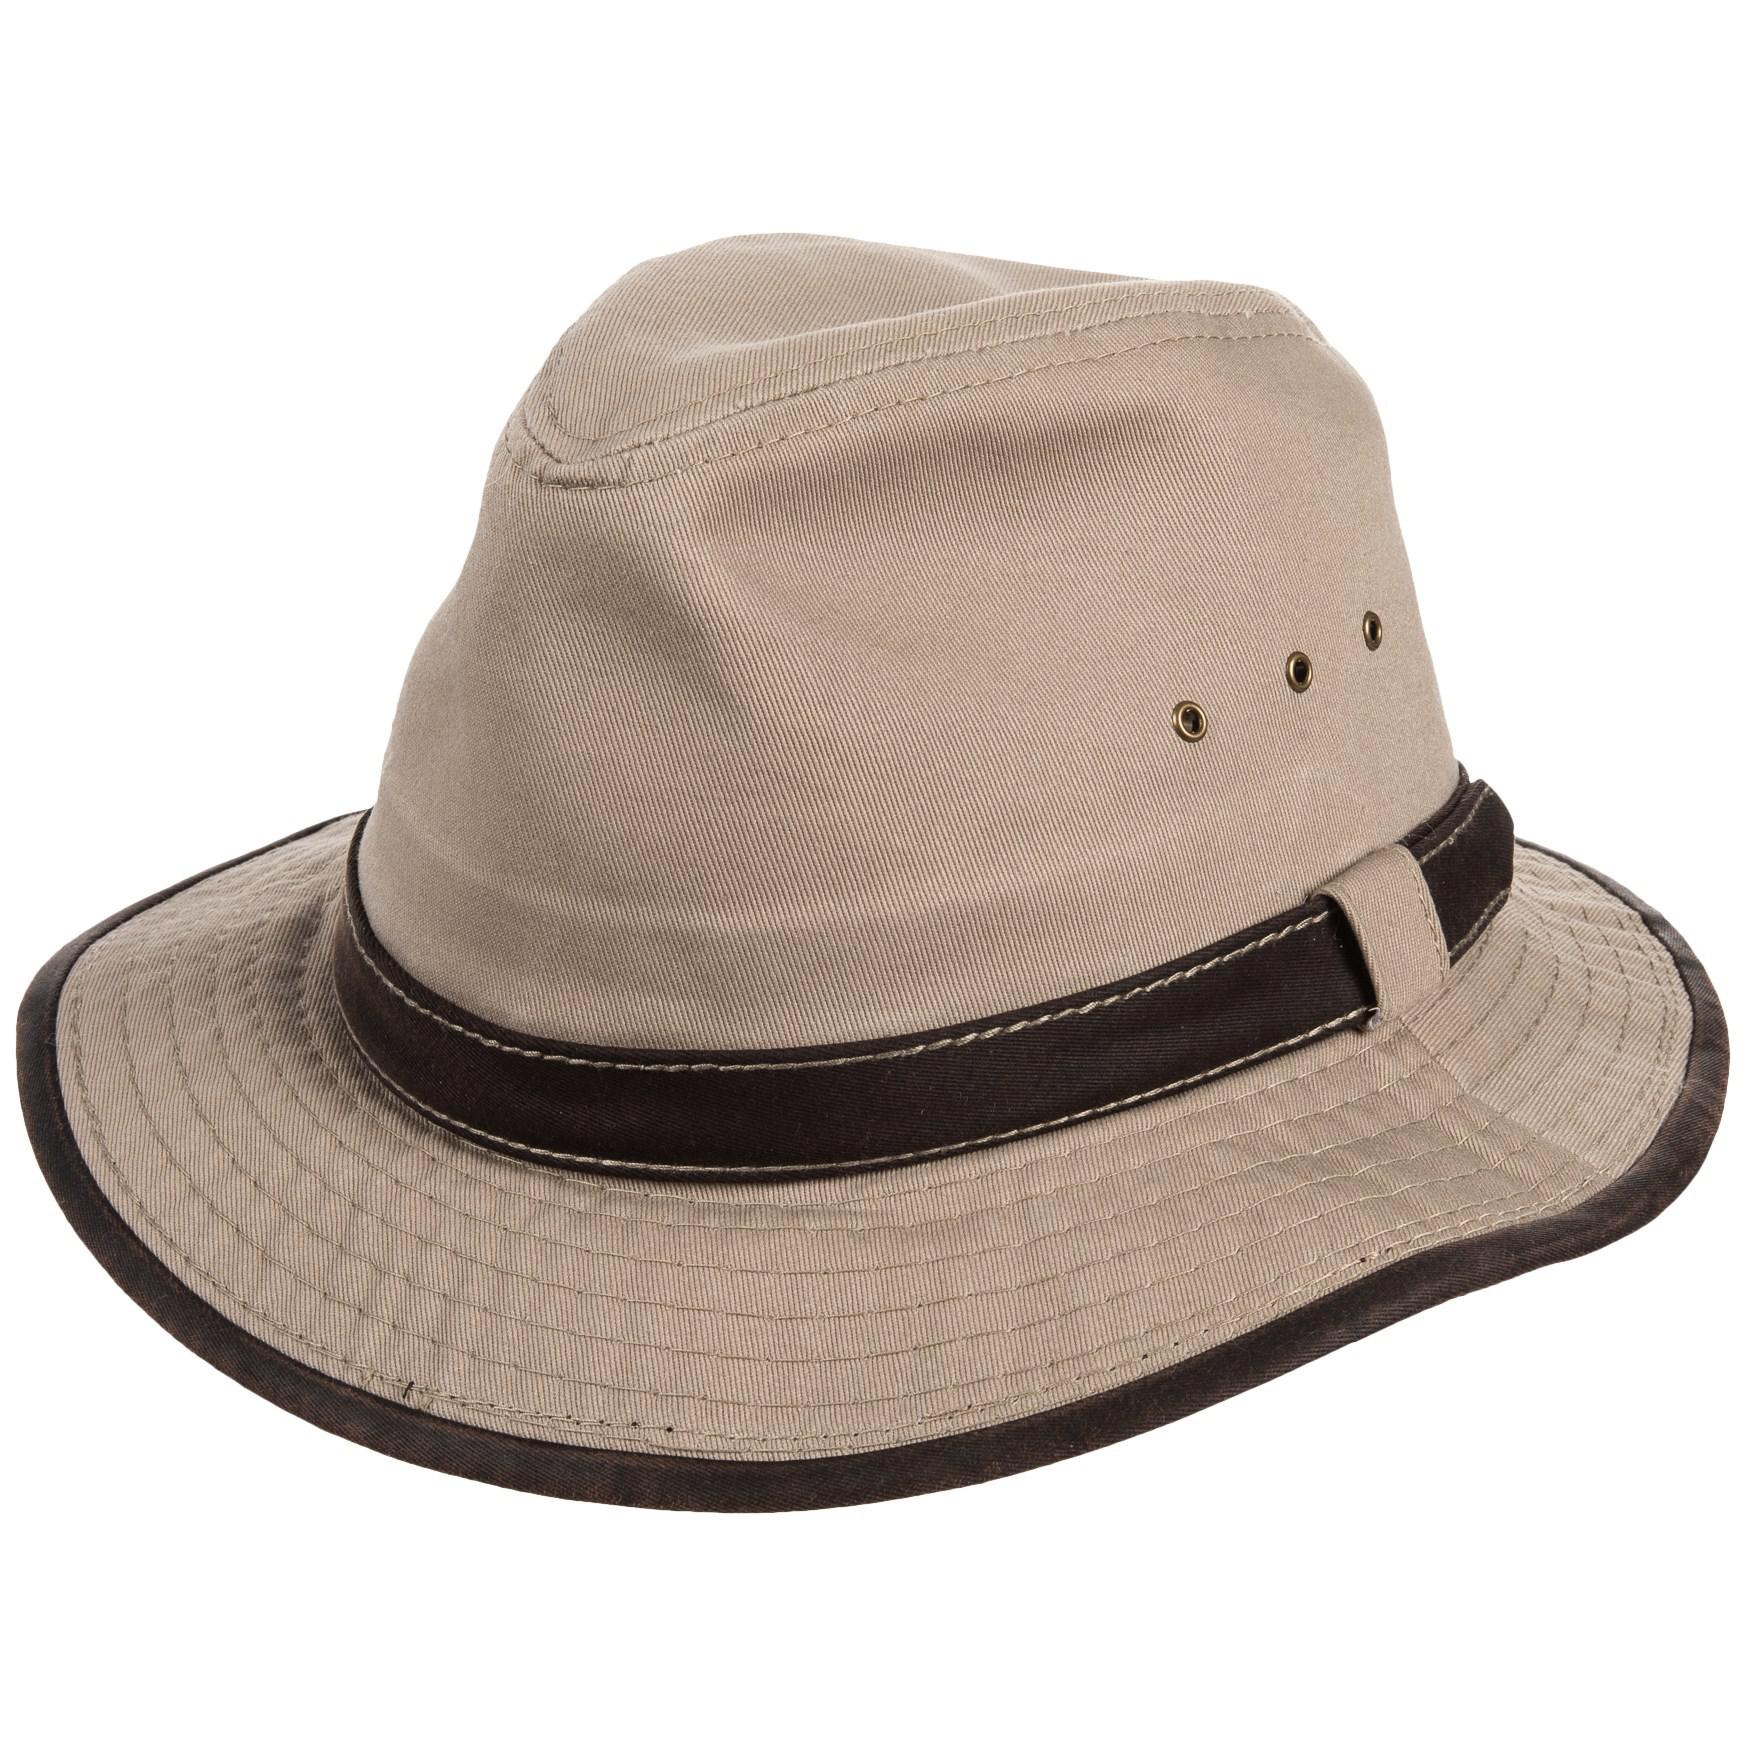 Lyst - Dorfman Pacific Garment-washed Twill Safari Hat in Natural ... ffbe5a21082e